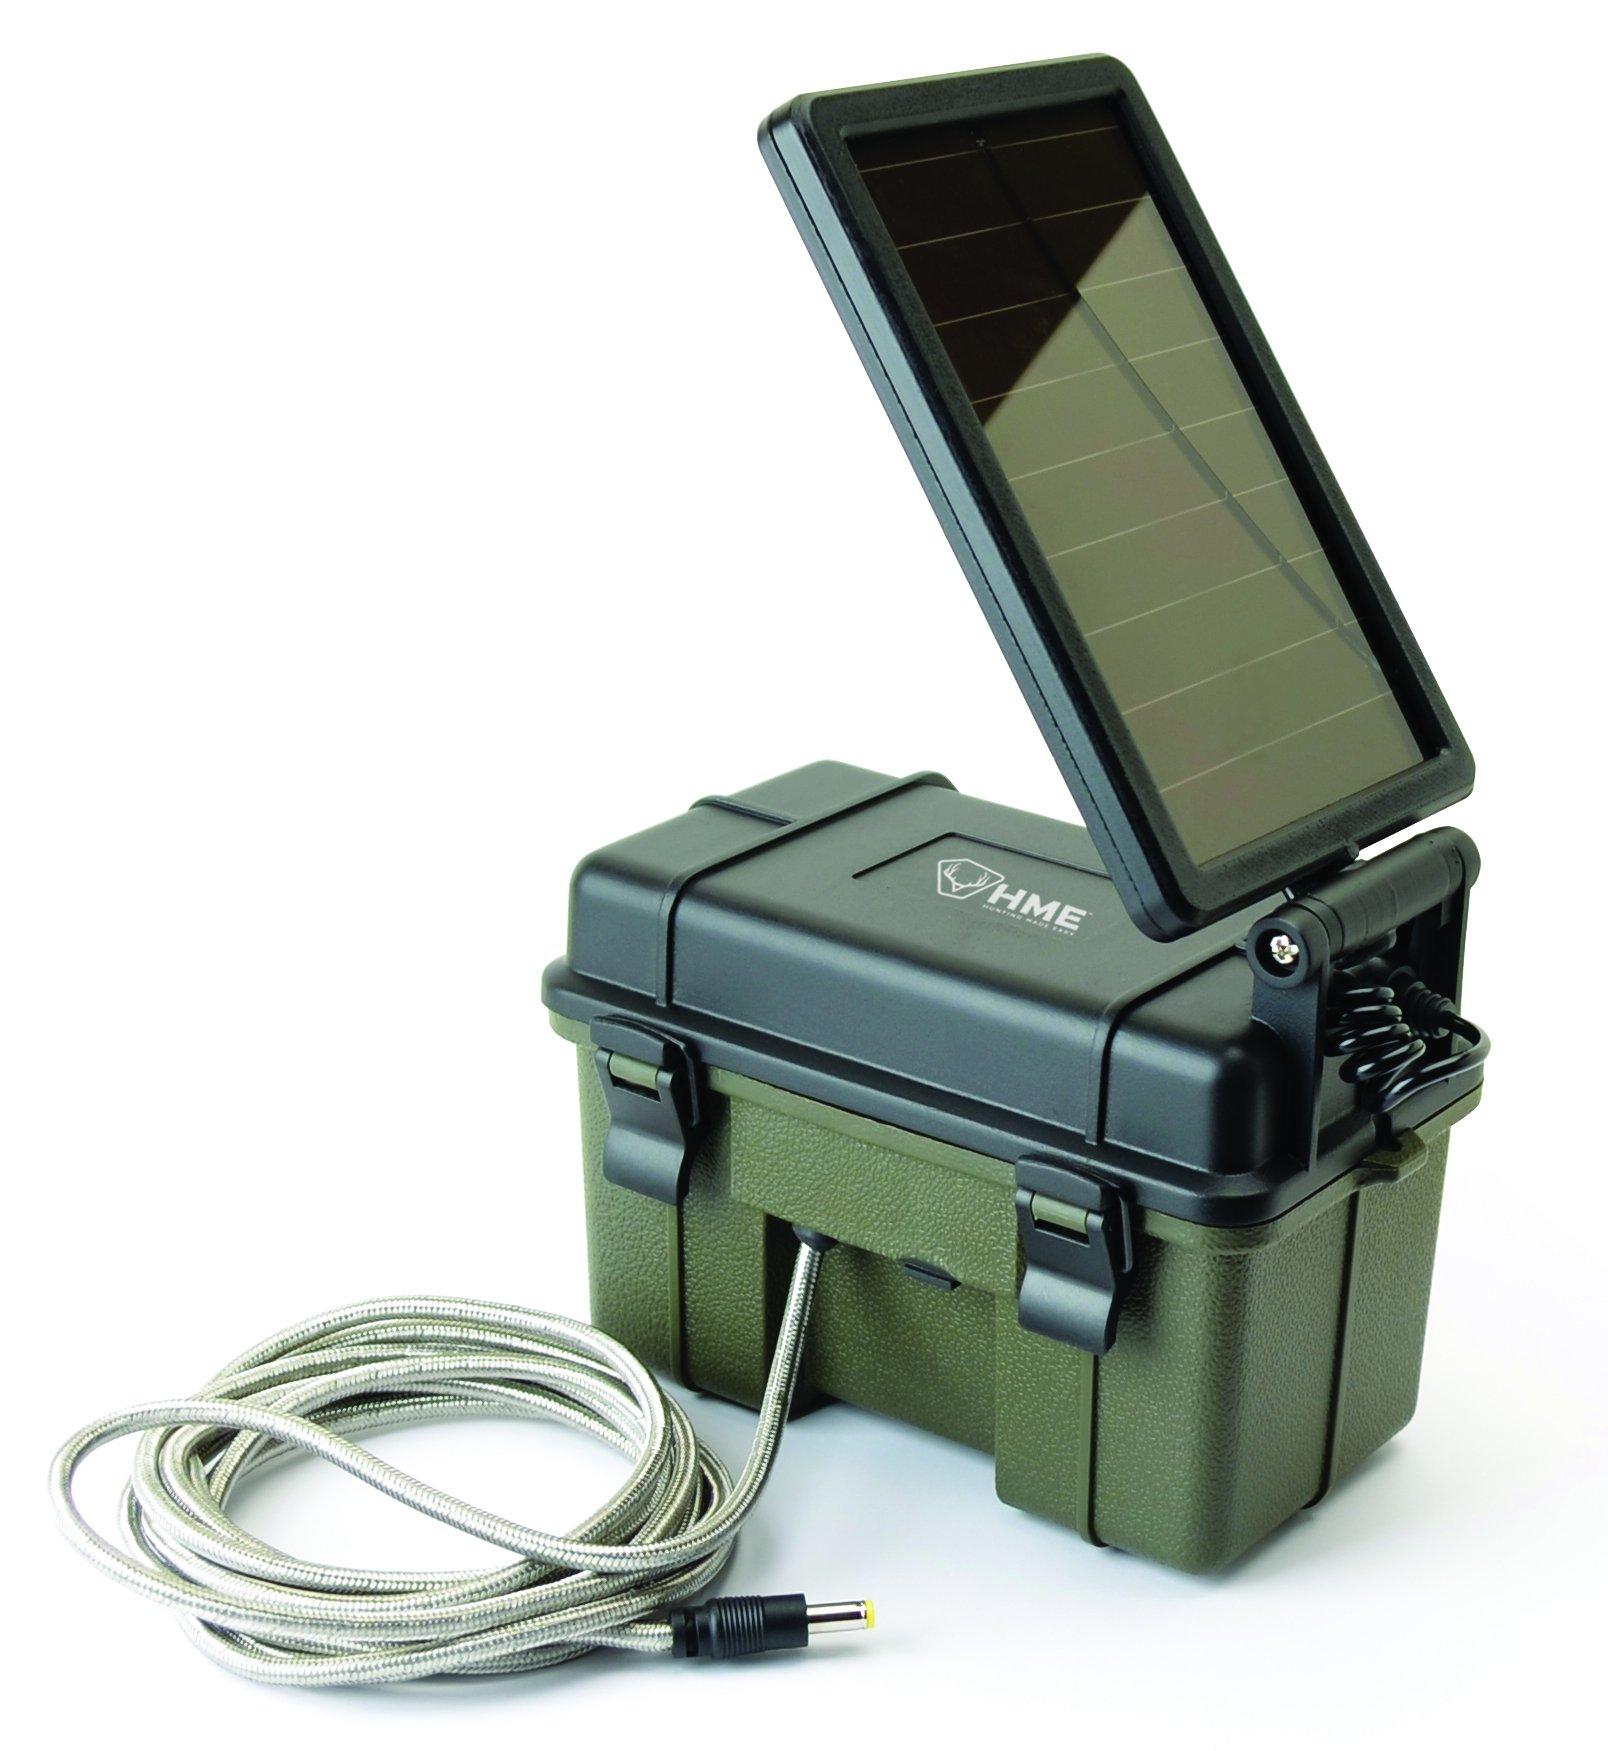 HME HME-12VBBSLR Trail Camera 12V / Solar Auxiliary Power Pack by HME